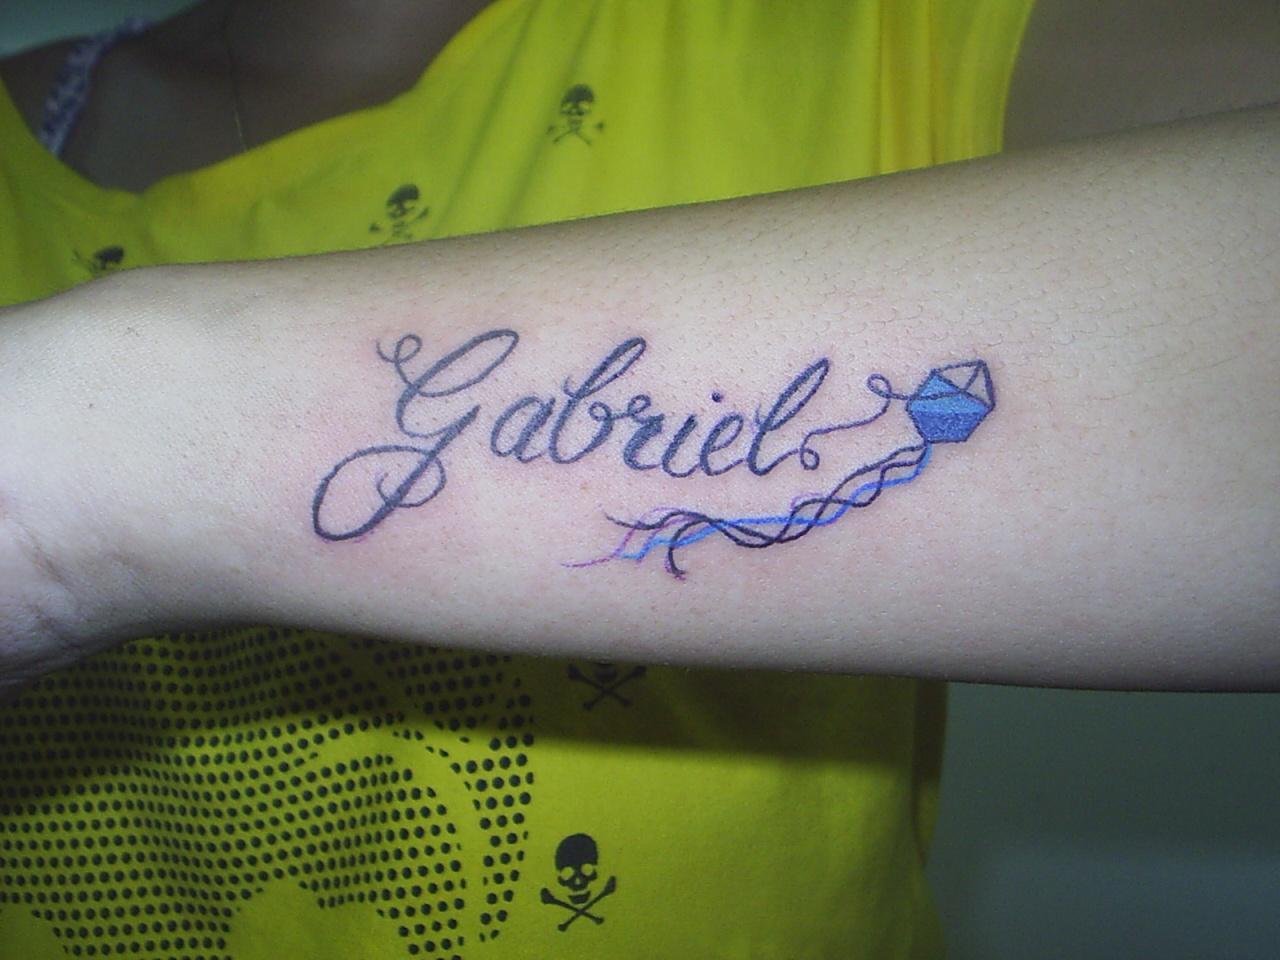 Tattoo nome gabriel da cliente eliete cultura e liberdade tattoo nome gabriel da cliente eliete altavistaventures Gallery